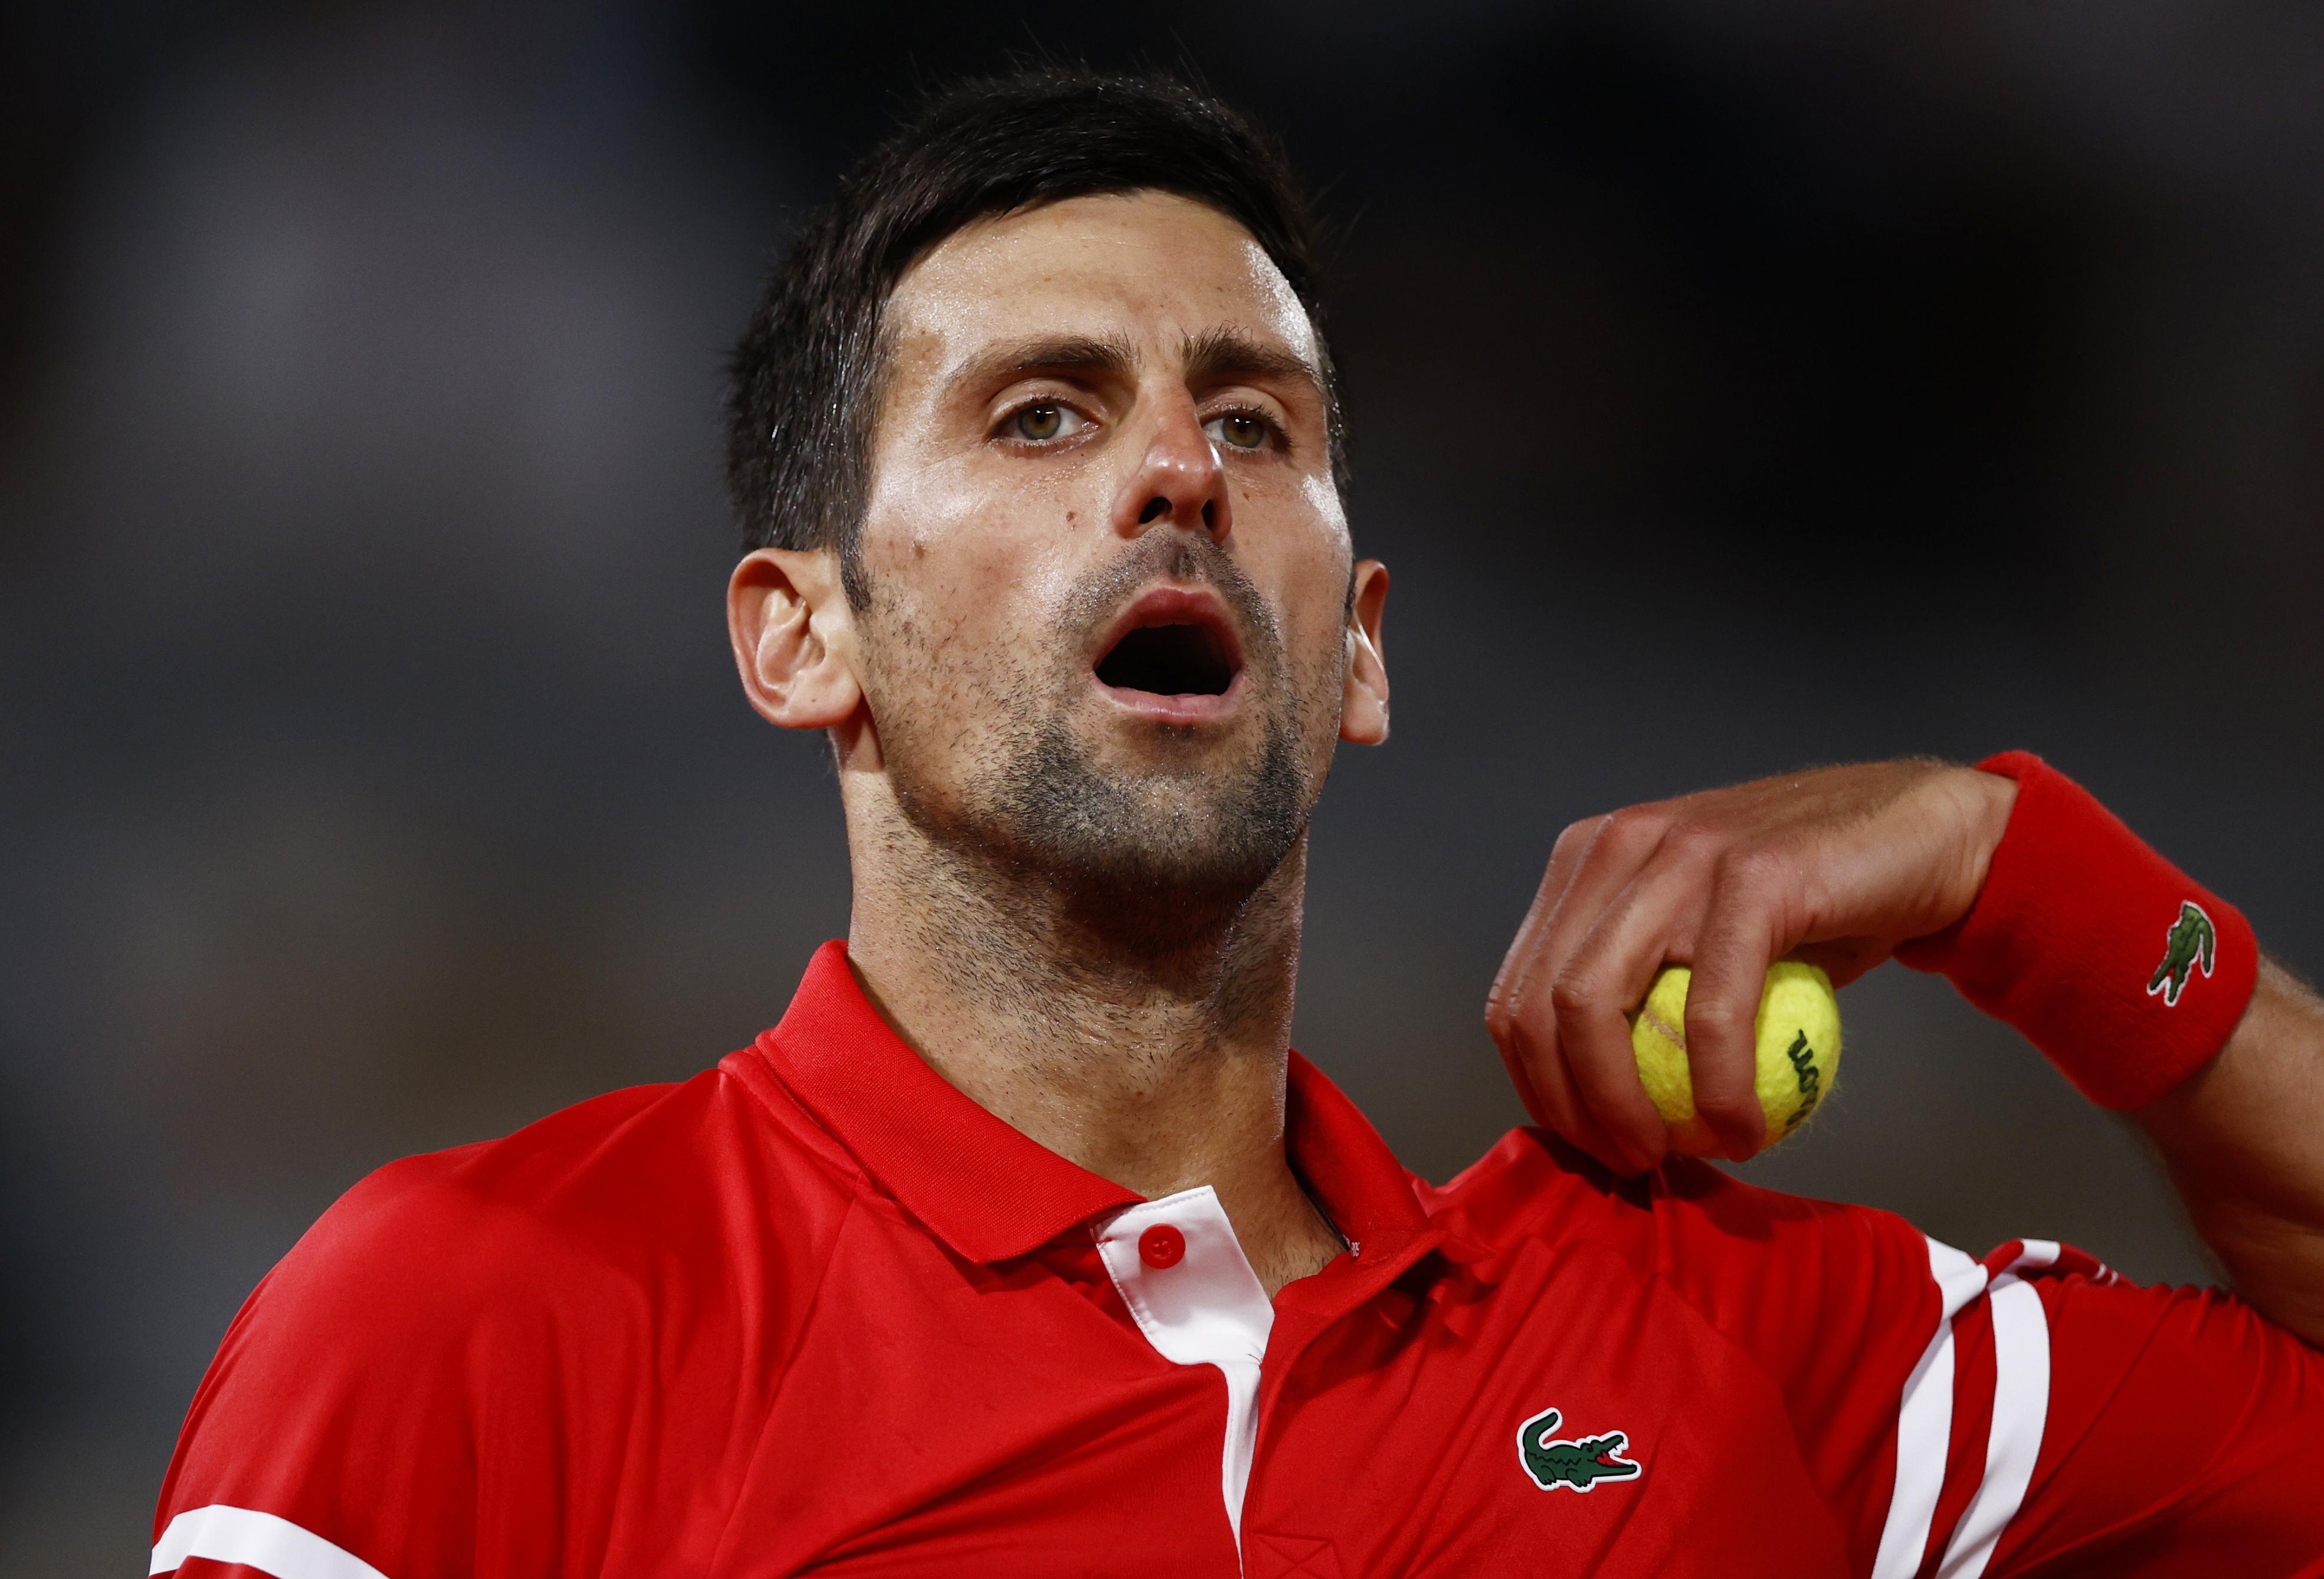 Tennis - French Open - Roland Garros, Paris, France - June 9, 2021  Serbia's Novak Djokovic reacts during his quarter final match against Italy's Matteo Berrettini REUTERS/Christian Hartmann